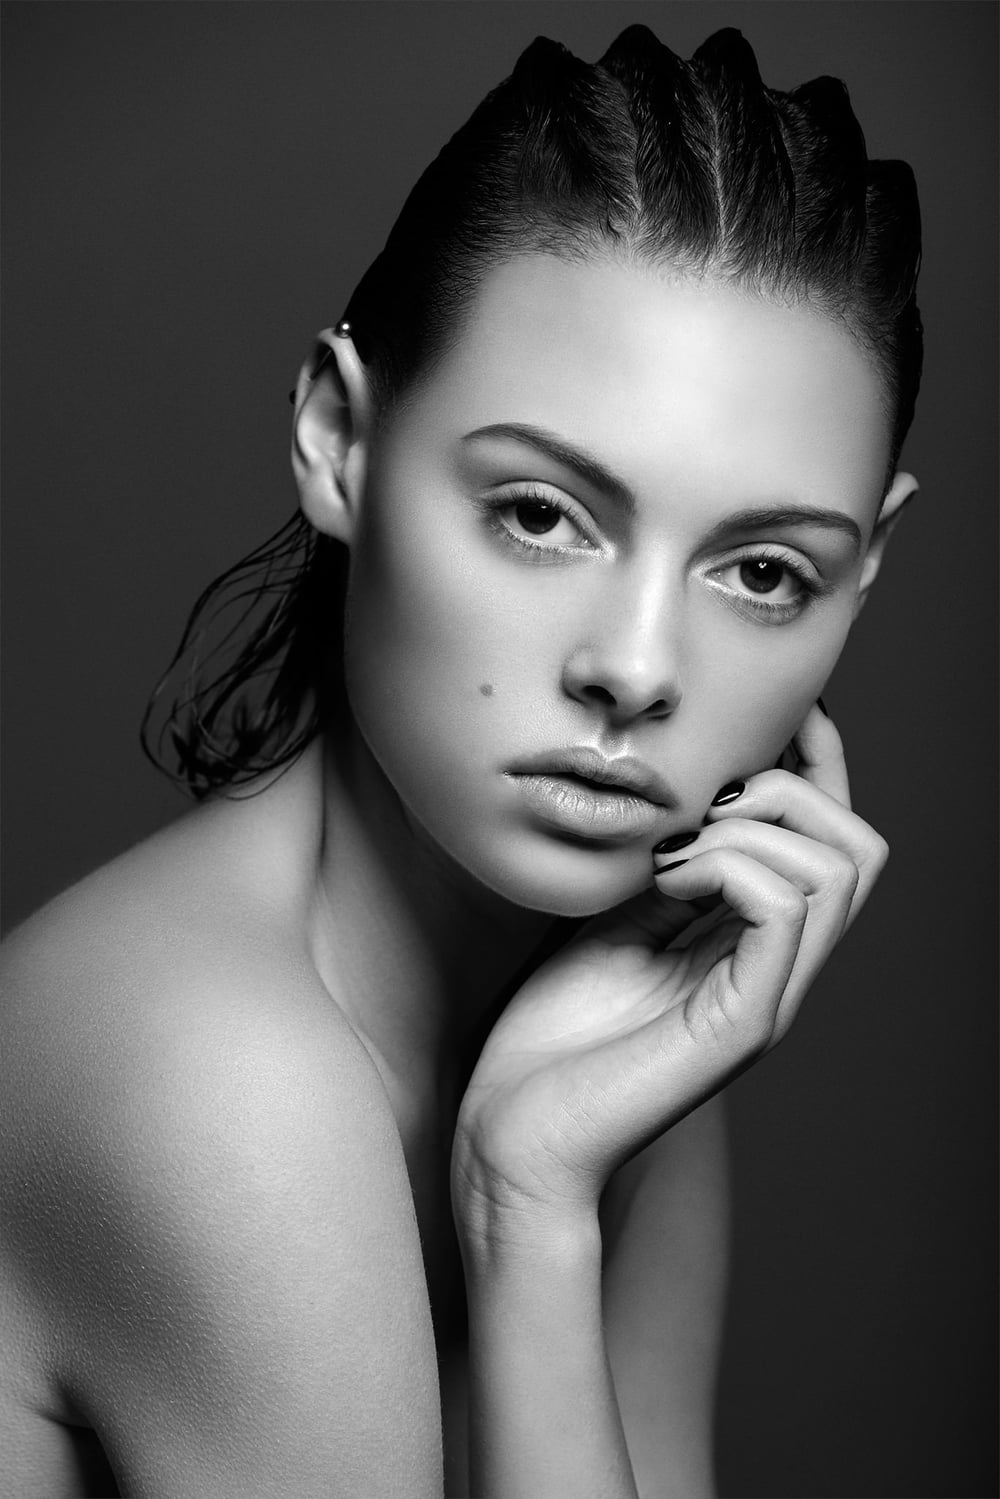 Isabella-beauty-1.1.jpg